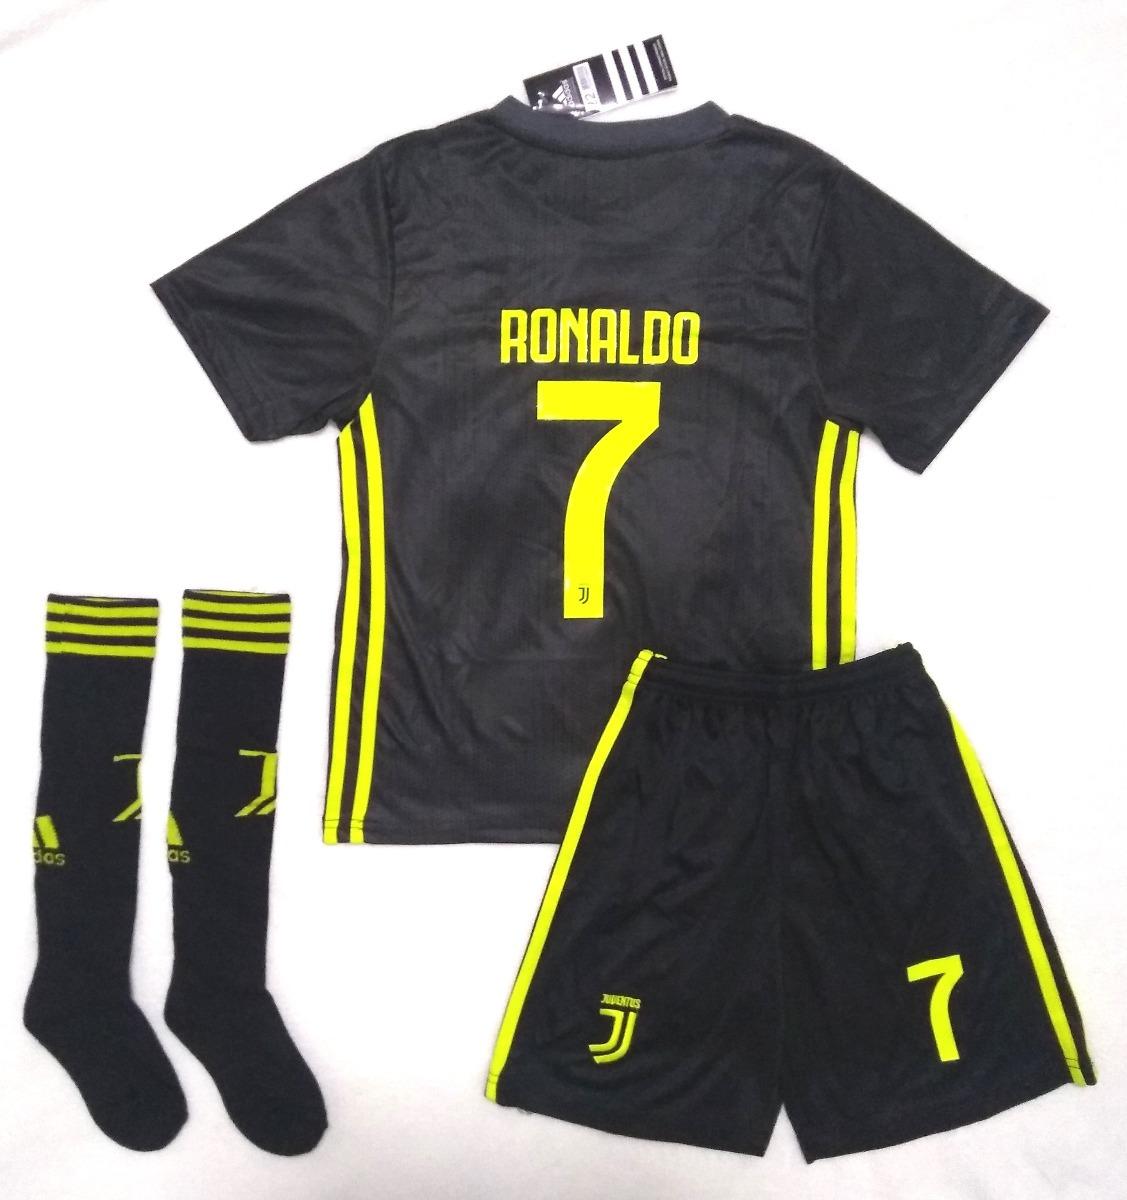 best sneakers 7614c 2308f Kit Infantil Juventus Third 2019 Ronaldo - Promoção